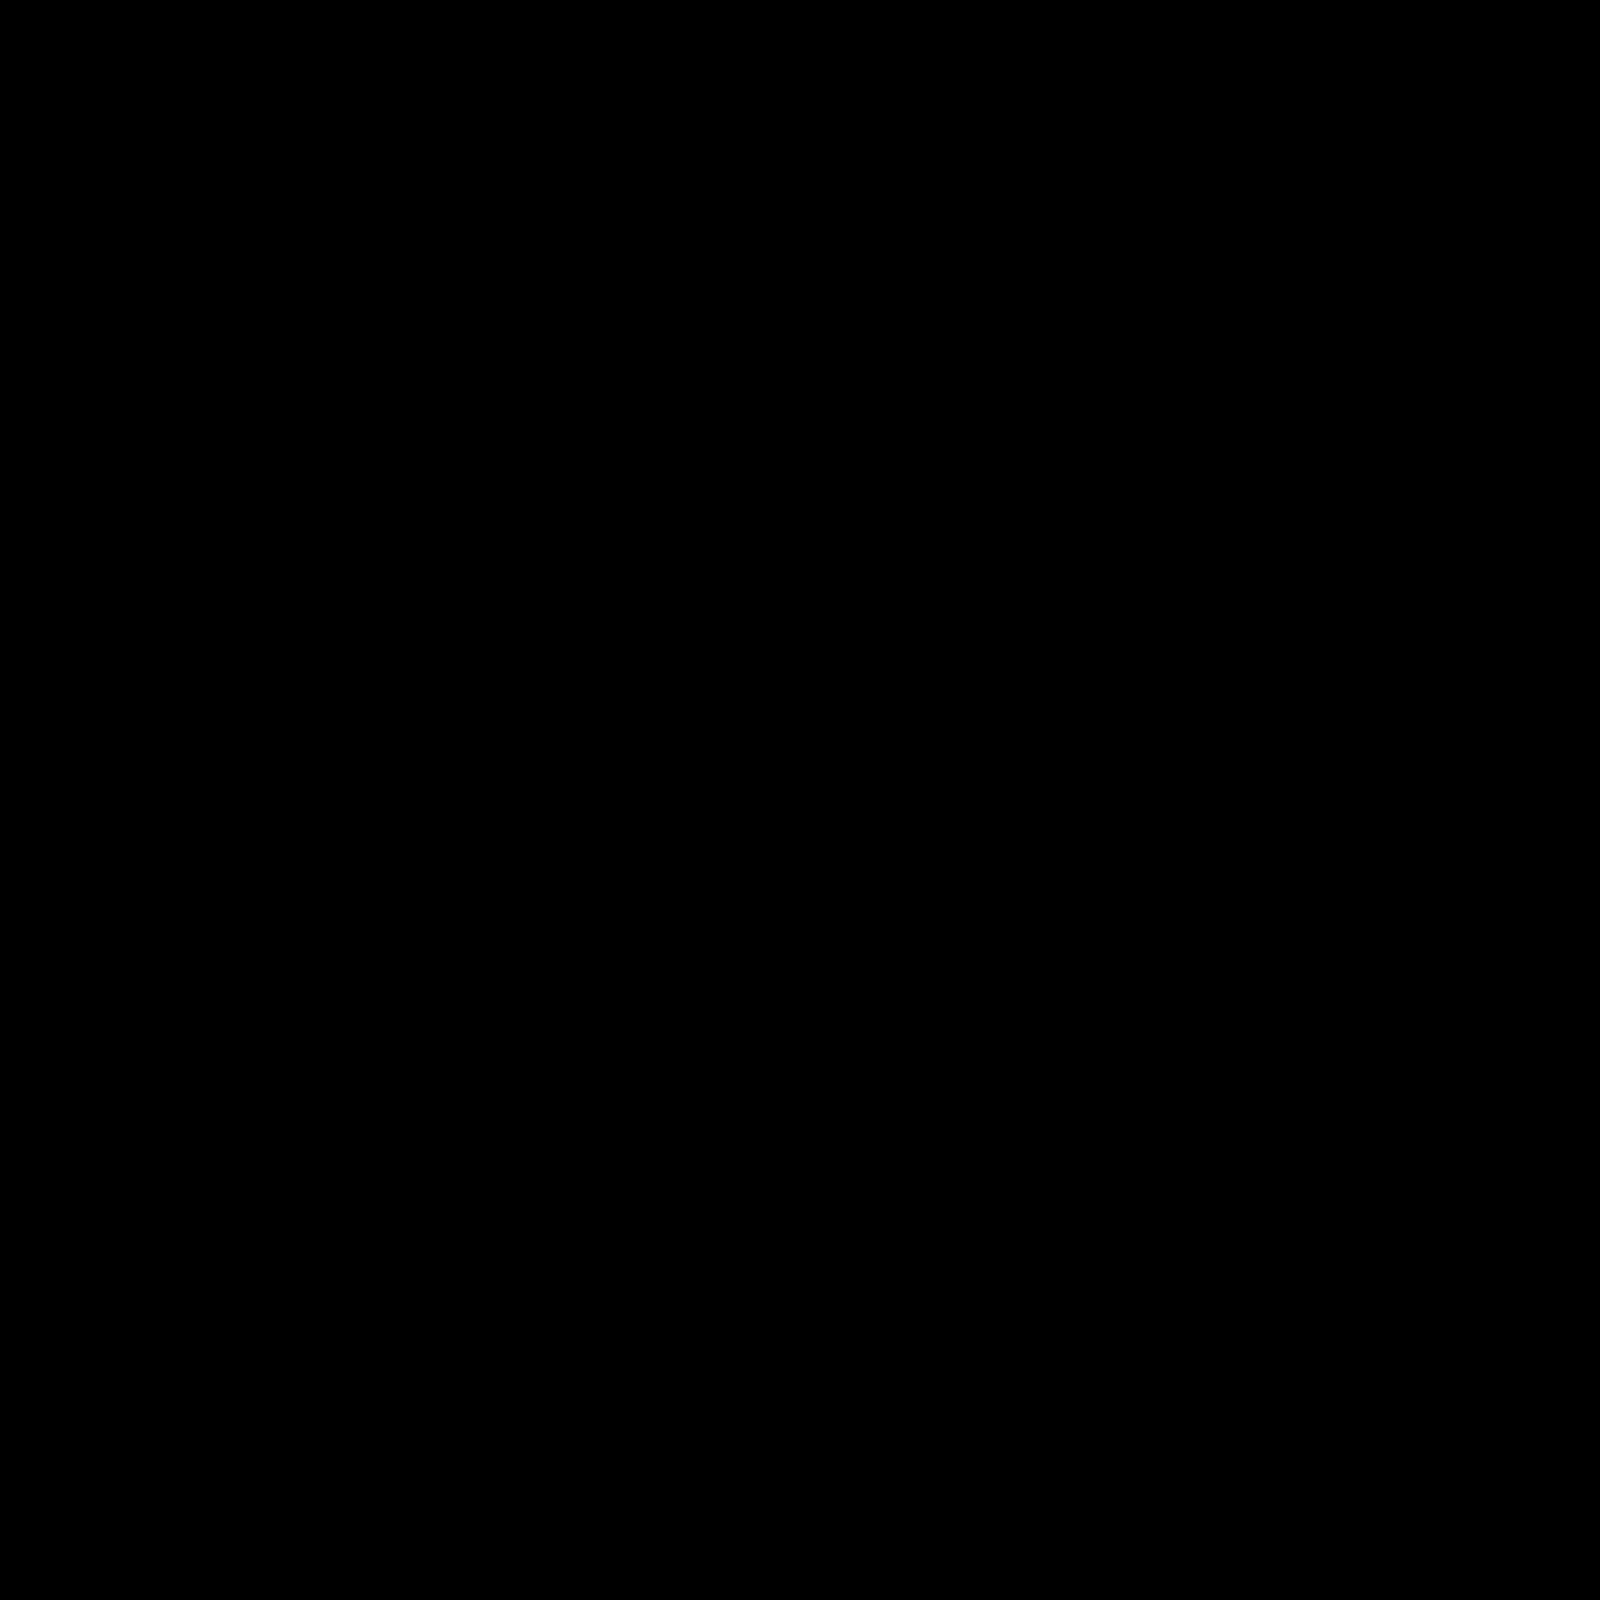 Folder lekarzy icon